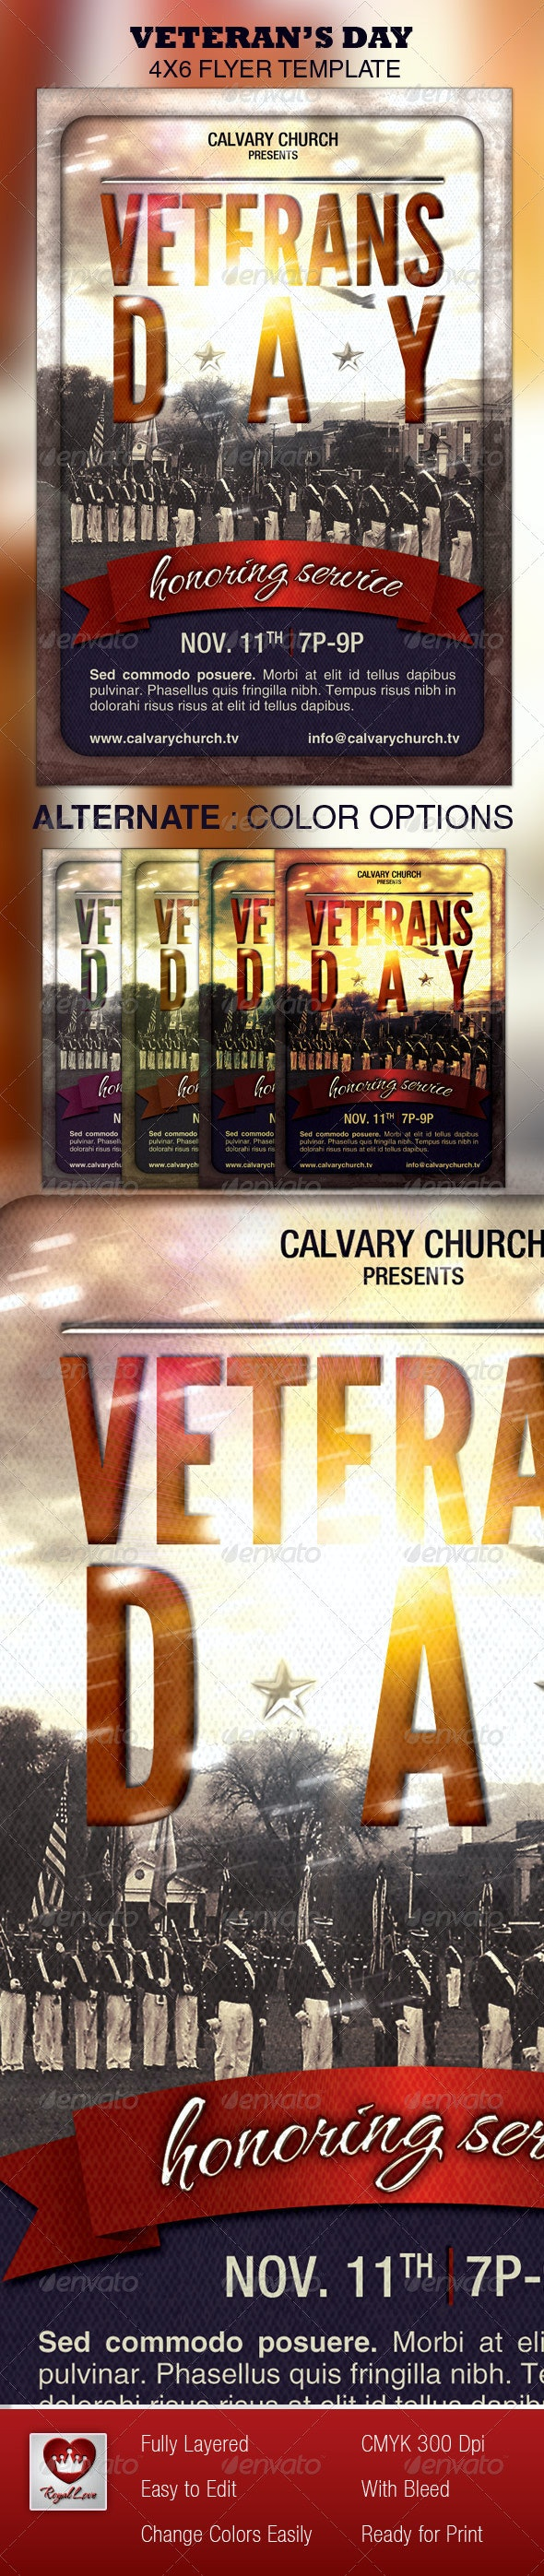 Veterans Day Church Flyer - Church Flyers